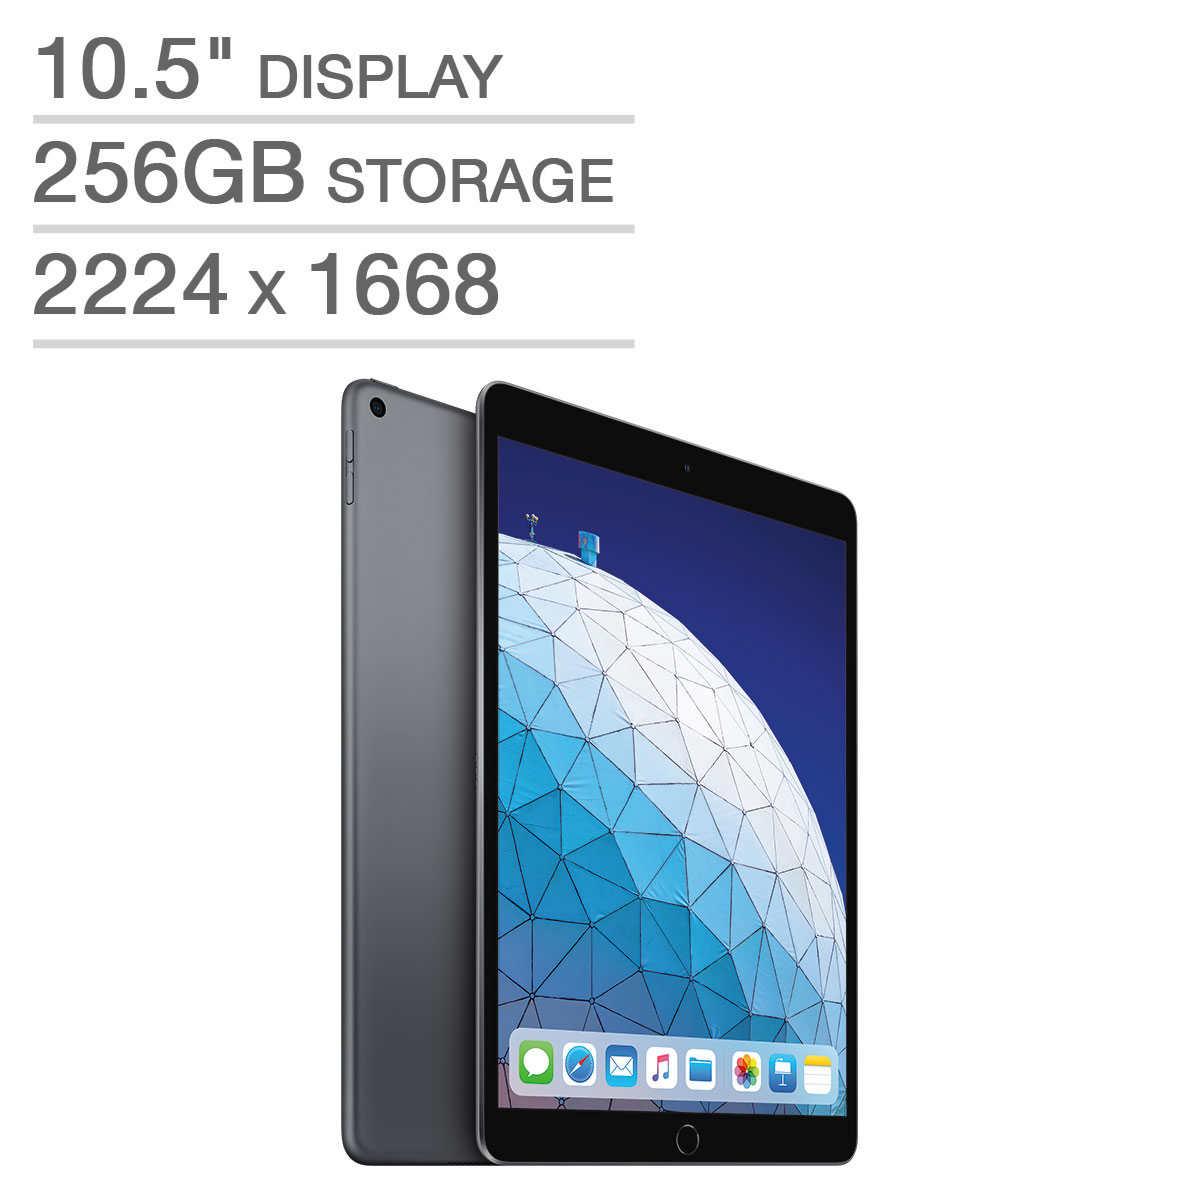 New Apple iPad Air - A12 Chip - 256GB - Latest Model $549.99